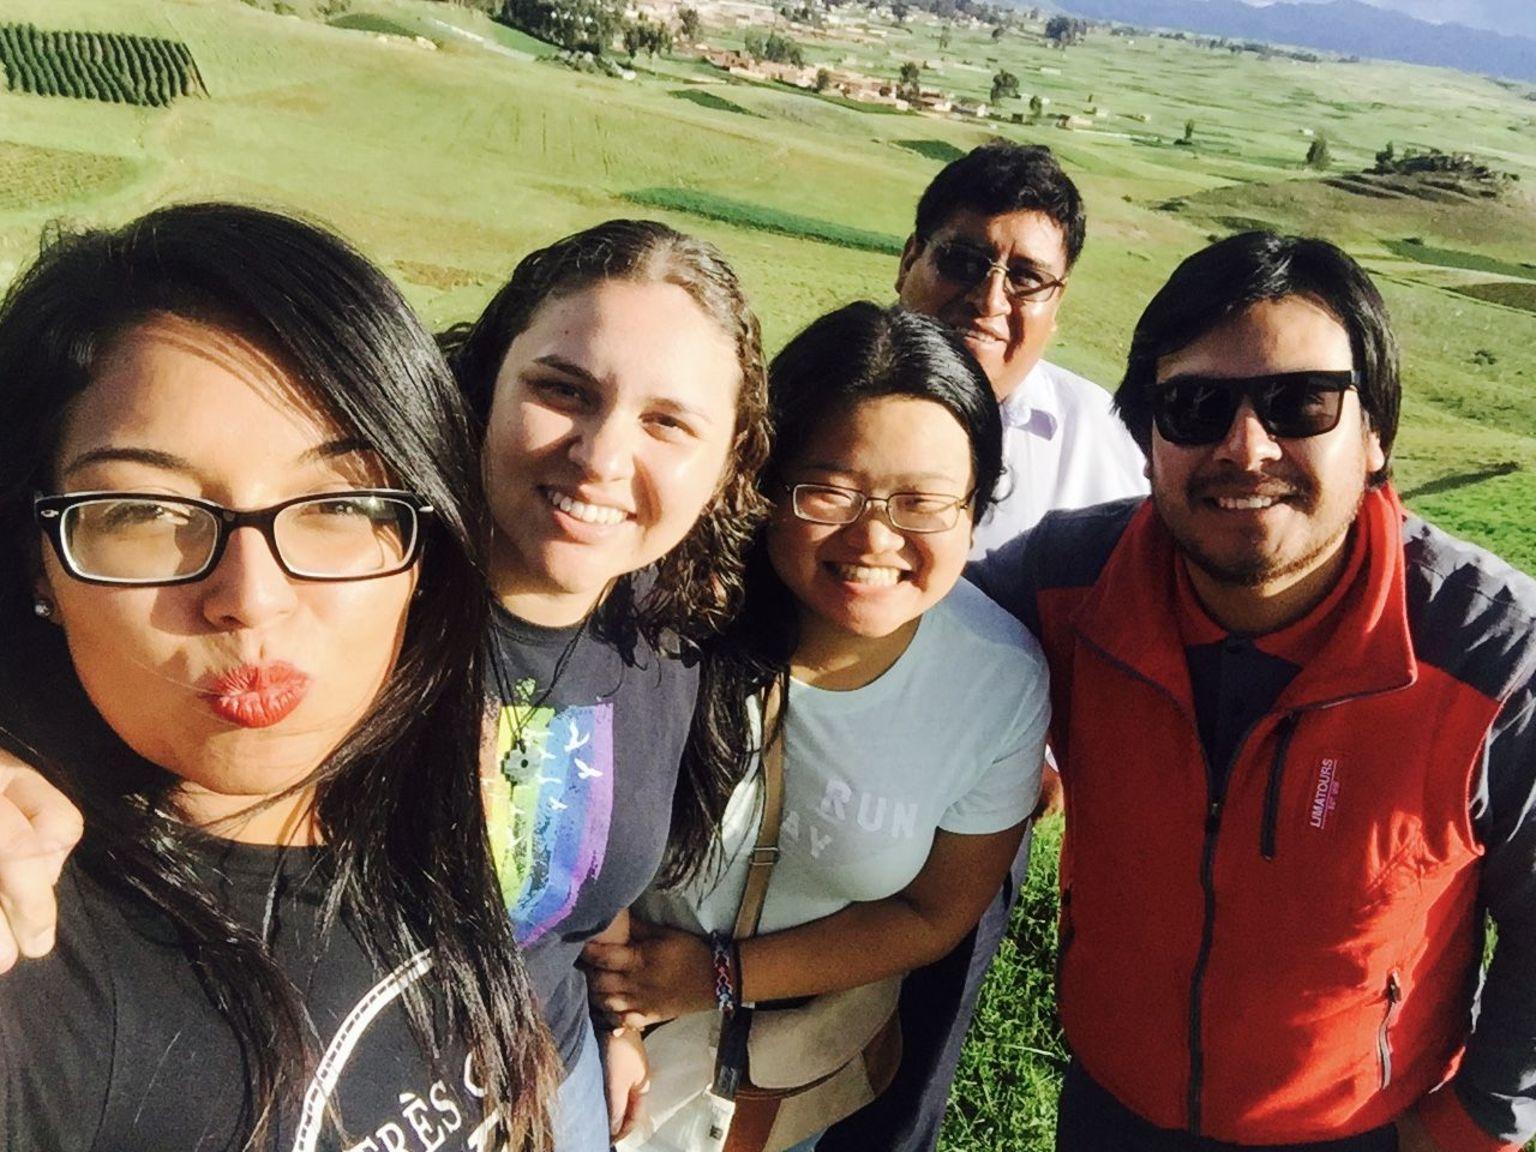 MORE PHOTOS, Sacred Valley Private: Chinchero,Maras,Moray,Ollantaytambo,Pisac Market & Lunch